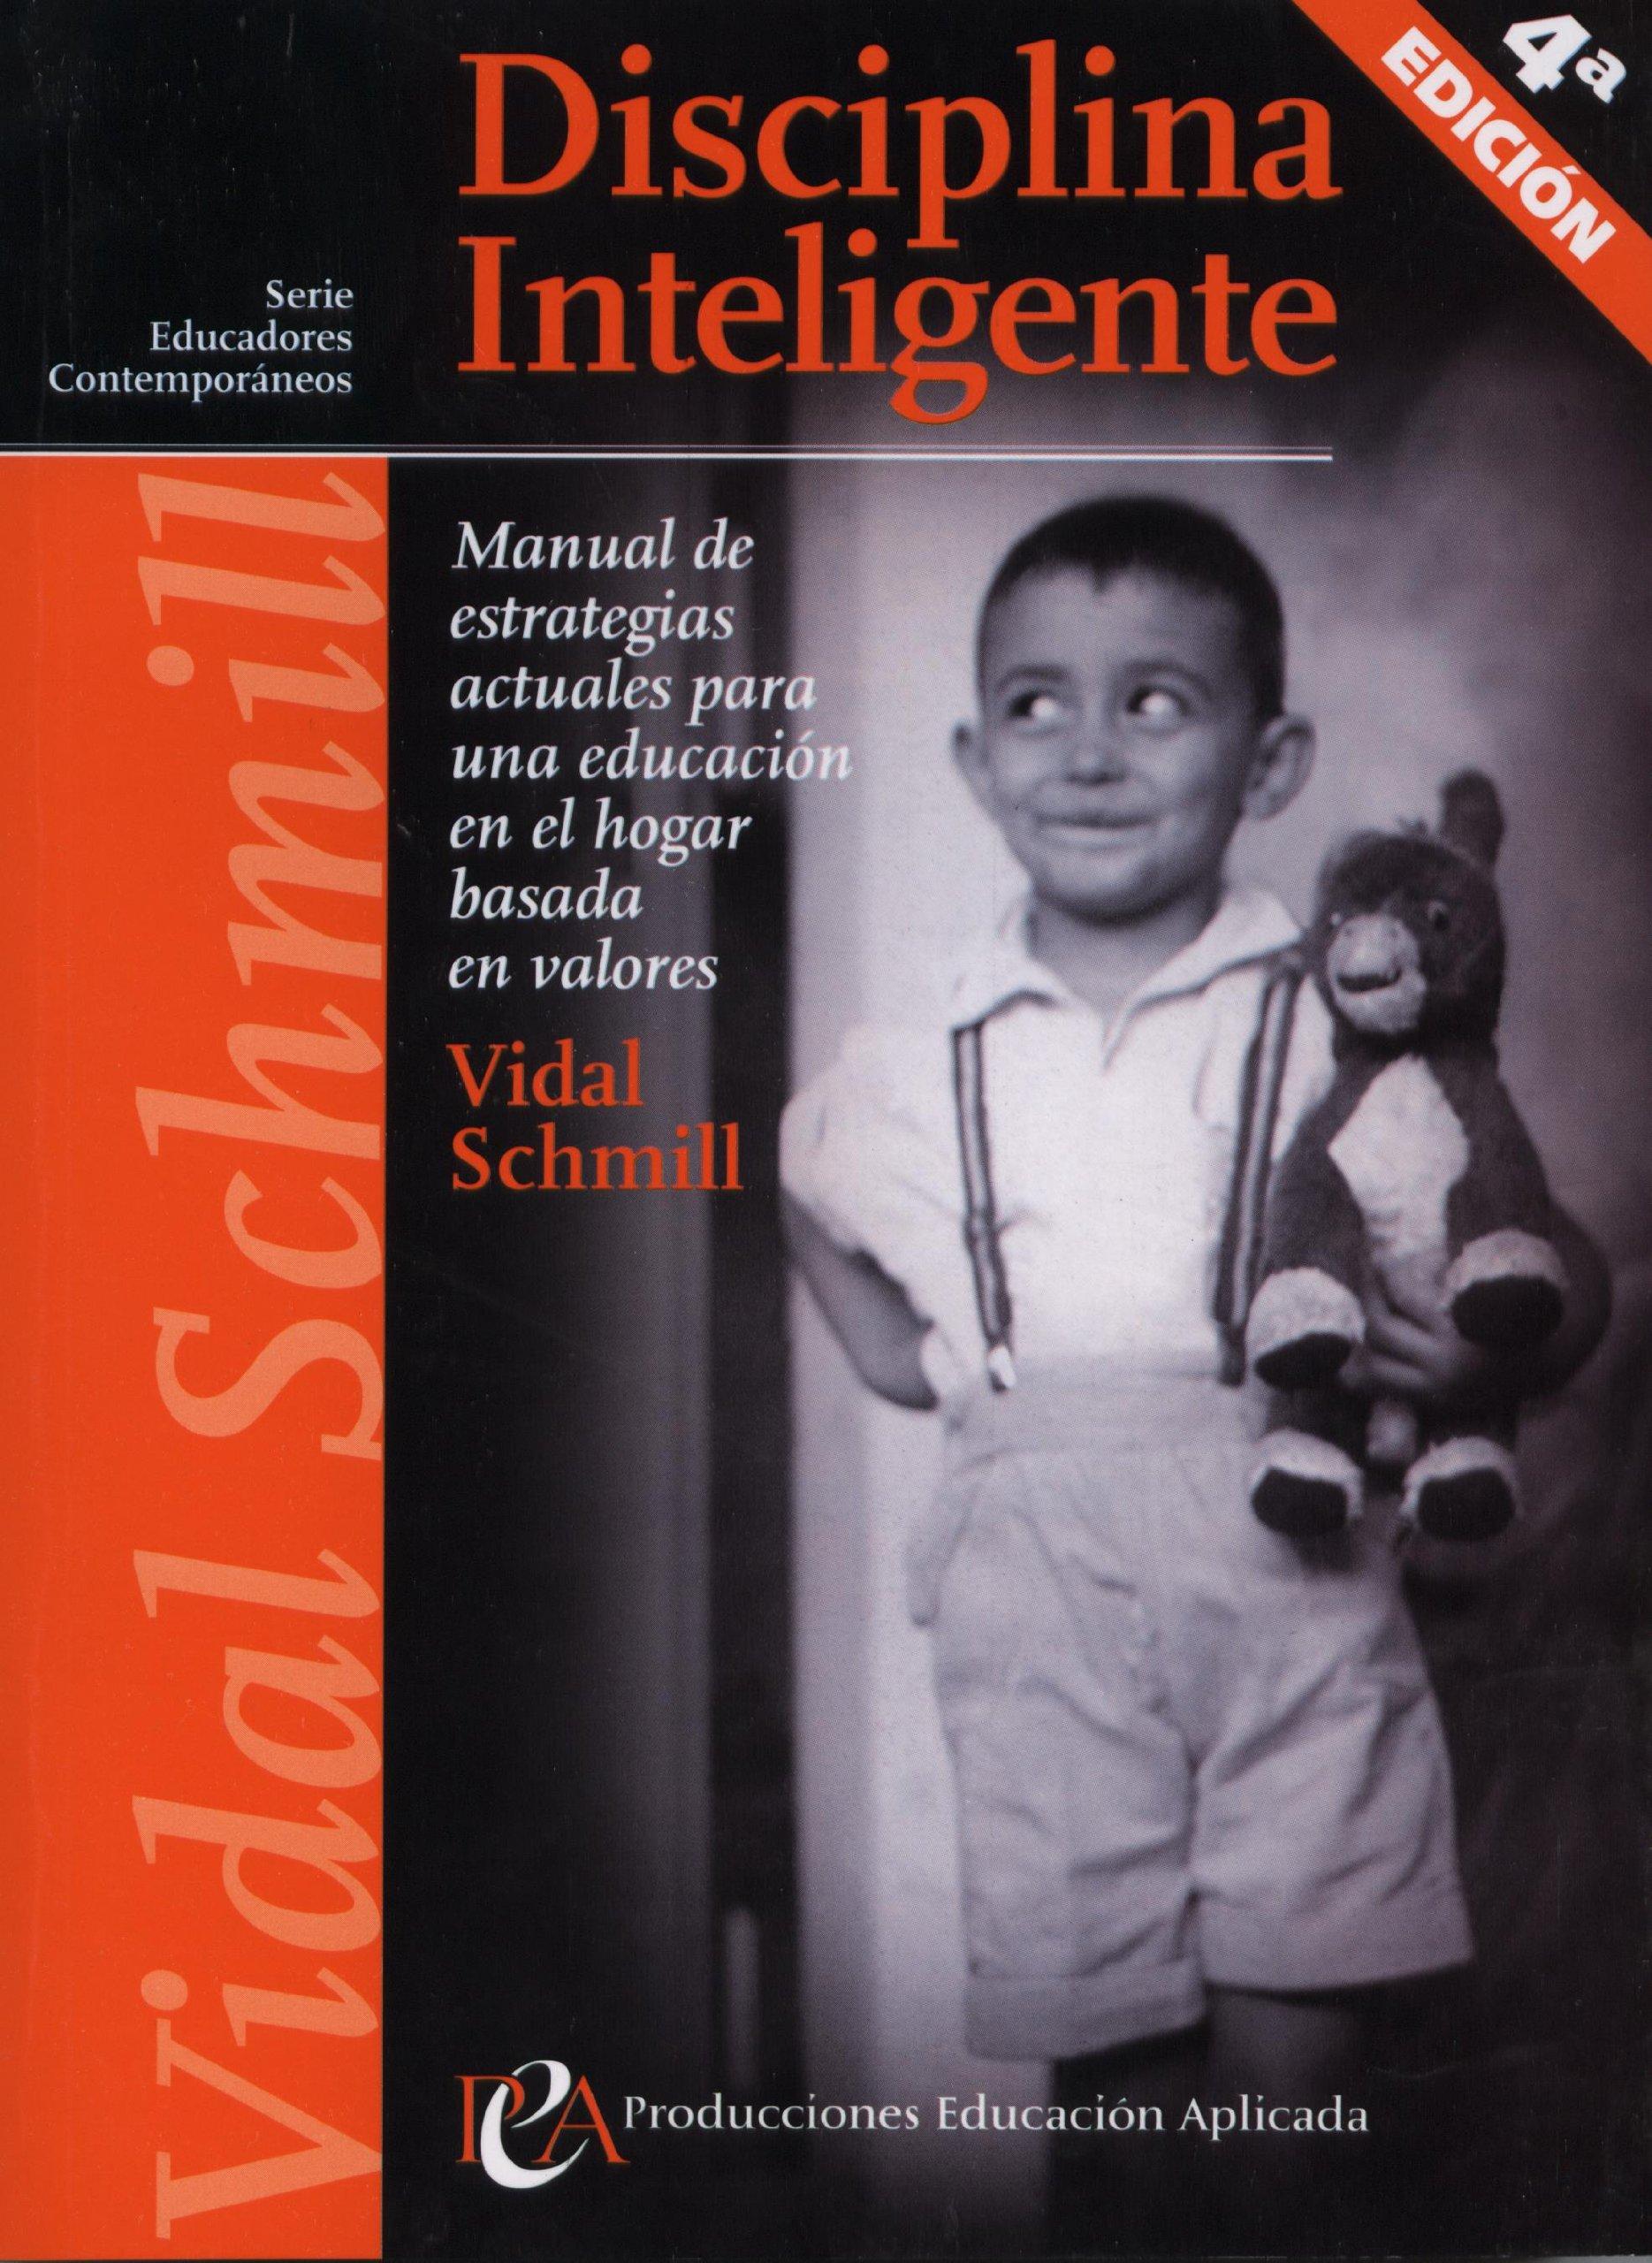 Disciplina inteligente spanish edition vidal schmill 9789685784016 amazon com books